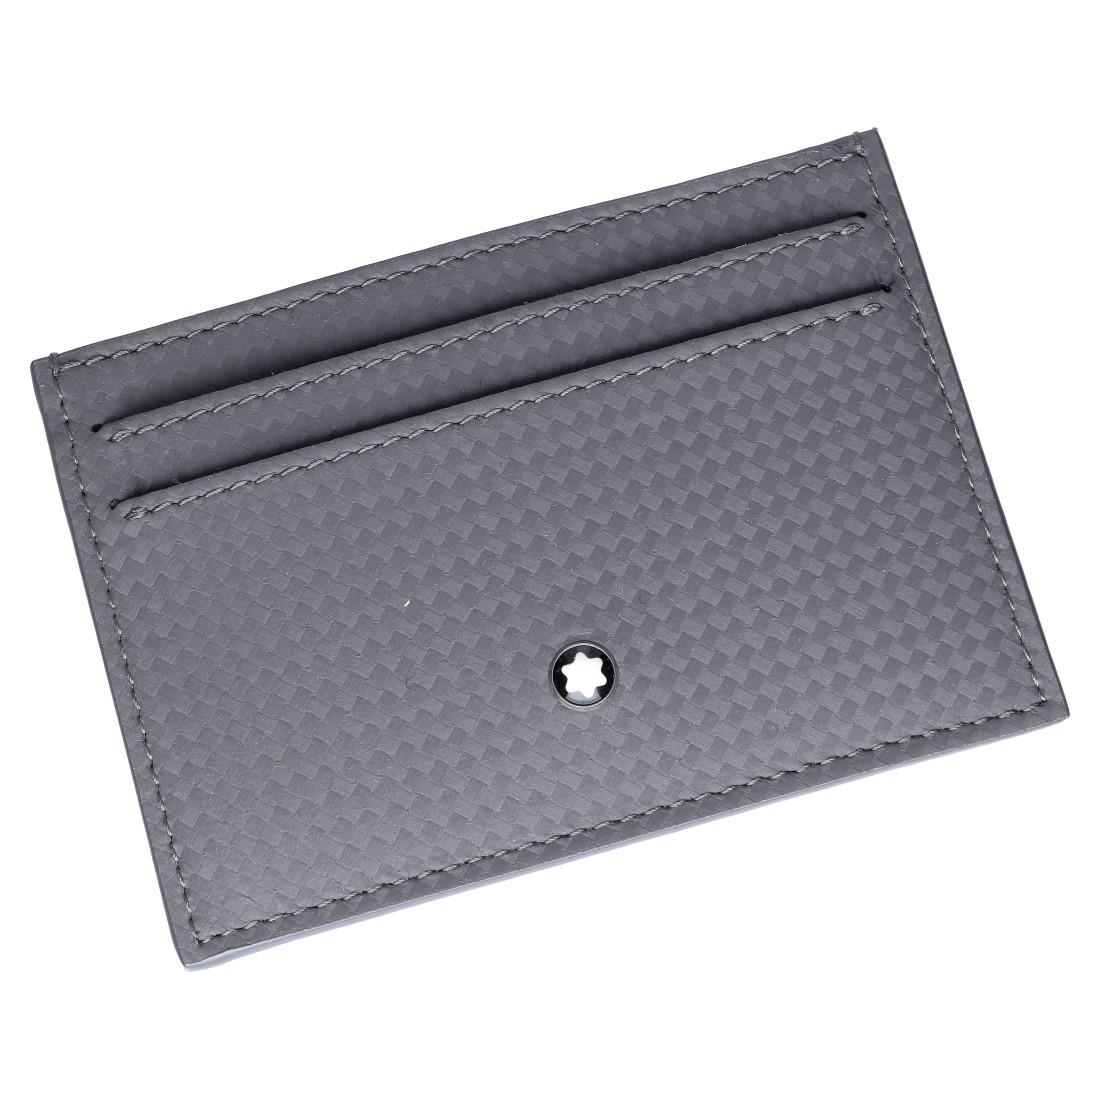 Porta carte 5 scomparti - MONTBLANC